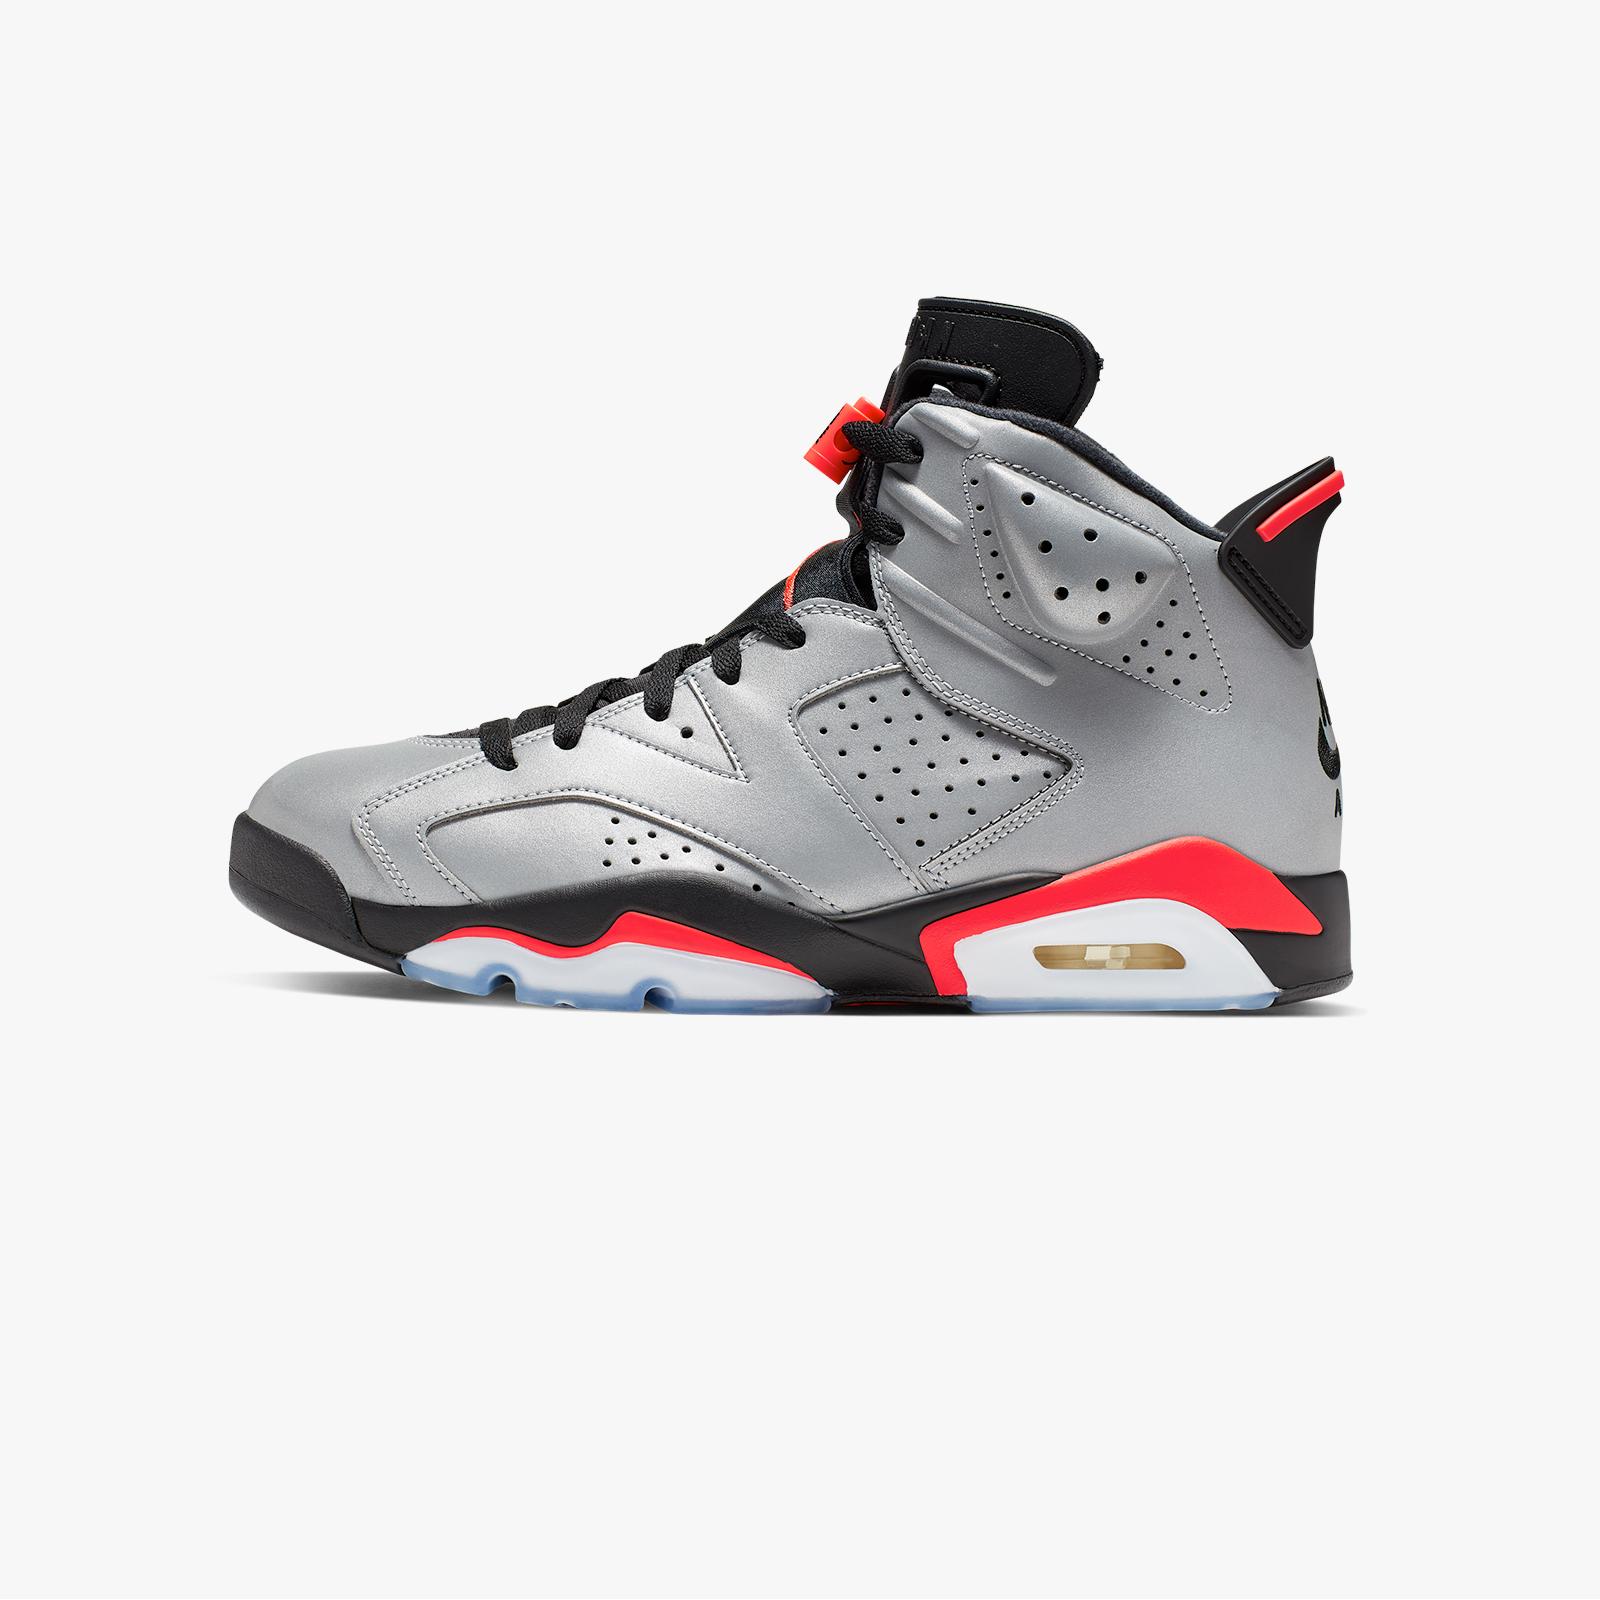 Jordan Brand Air Jordan 6 Retro SP